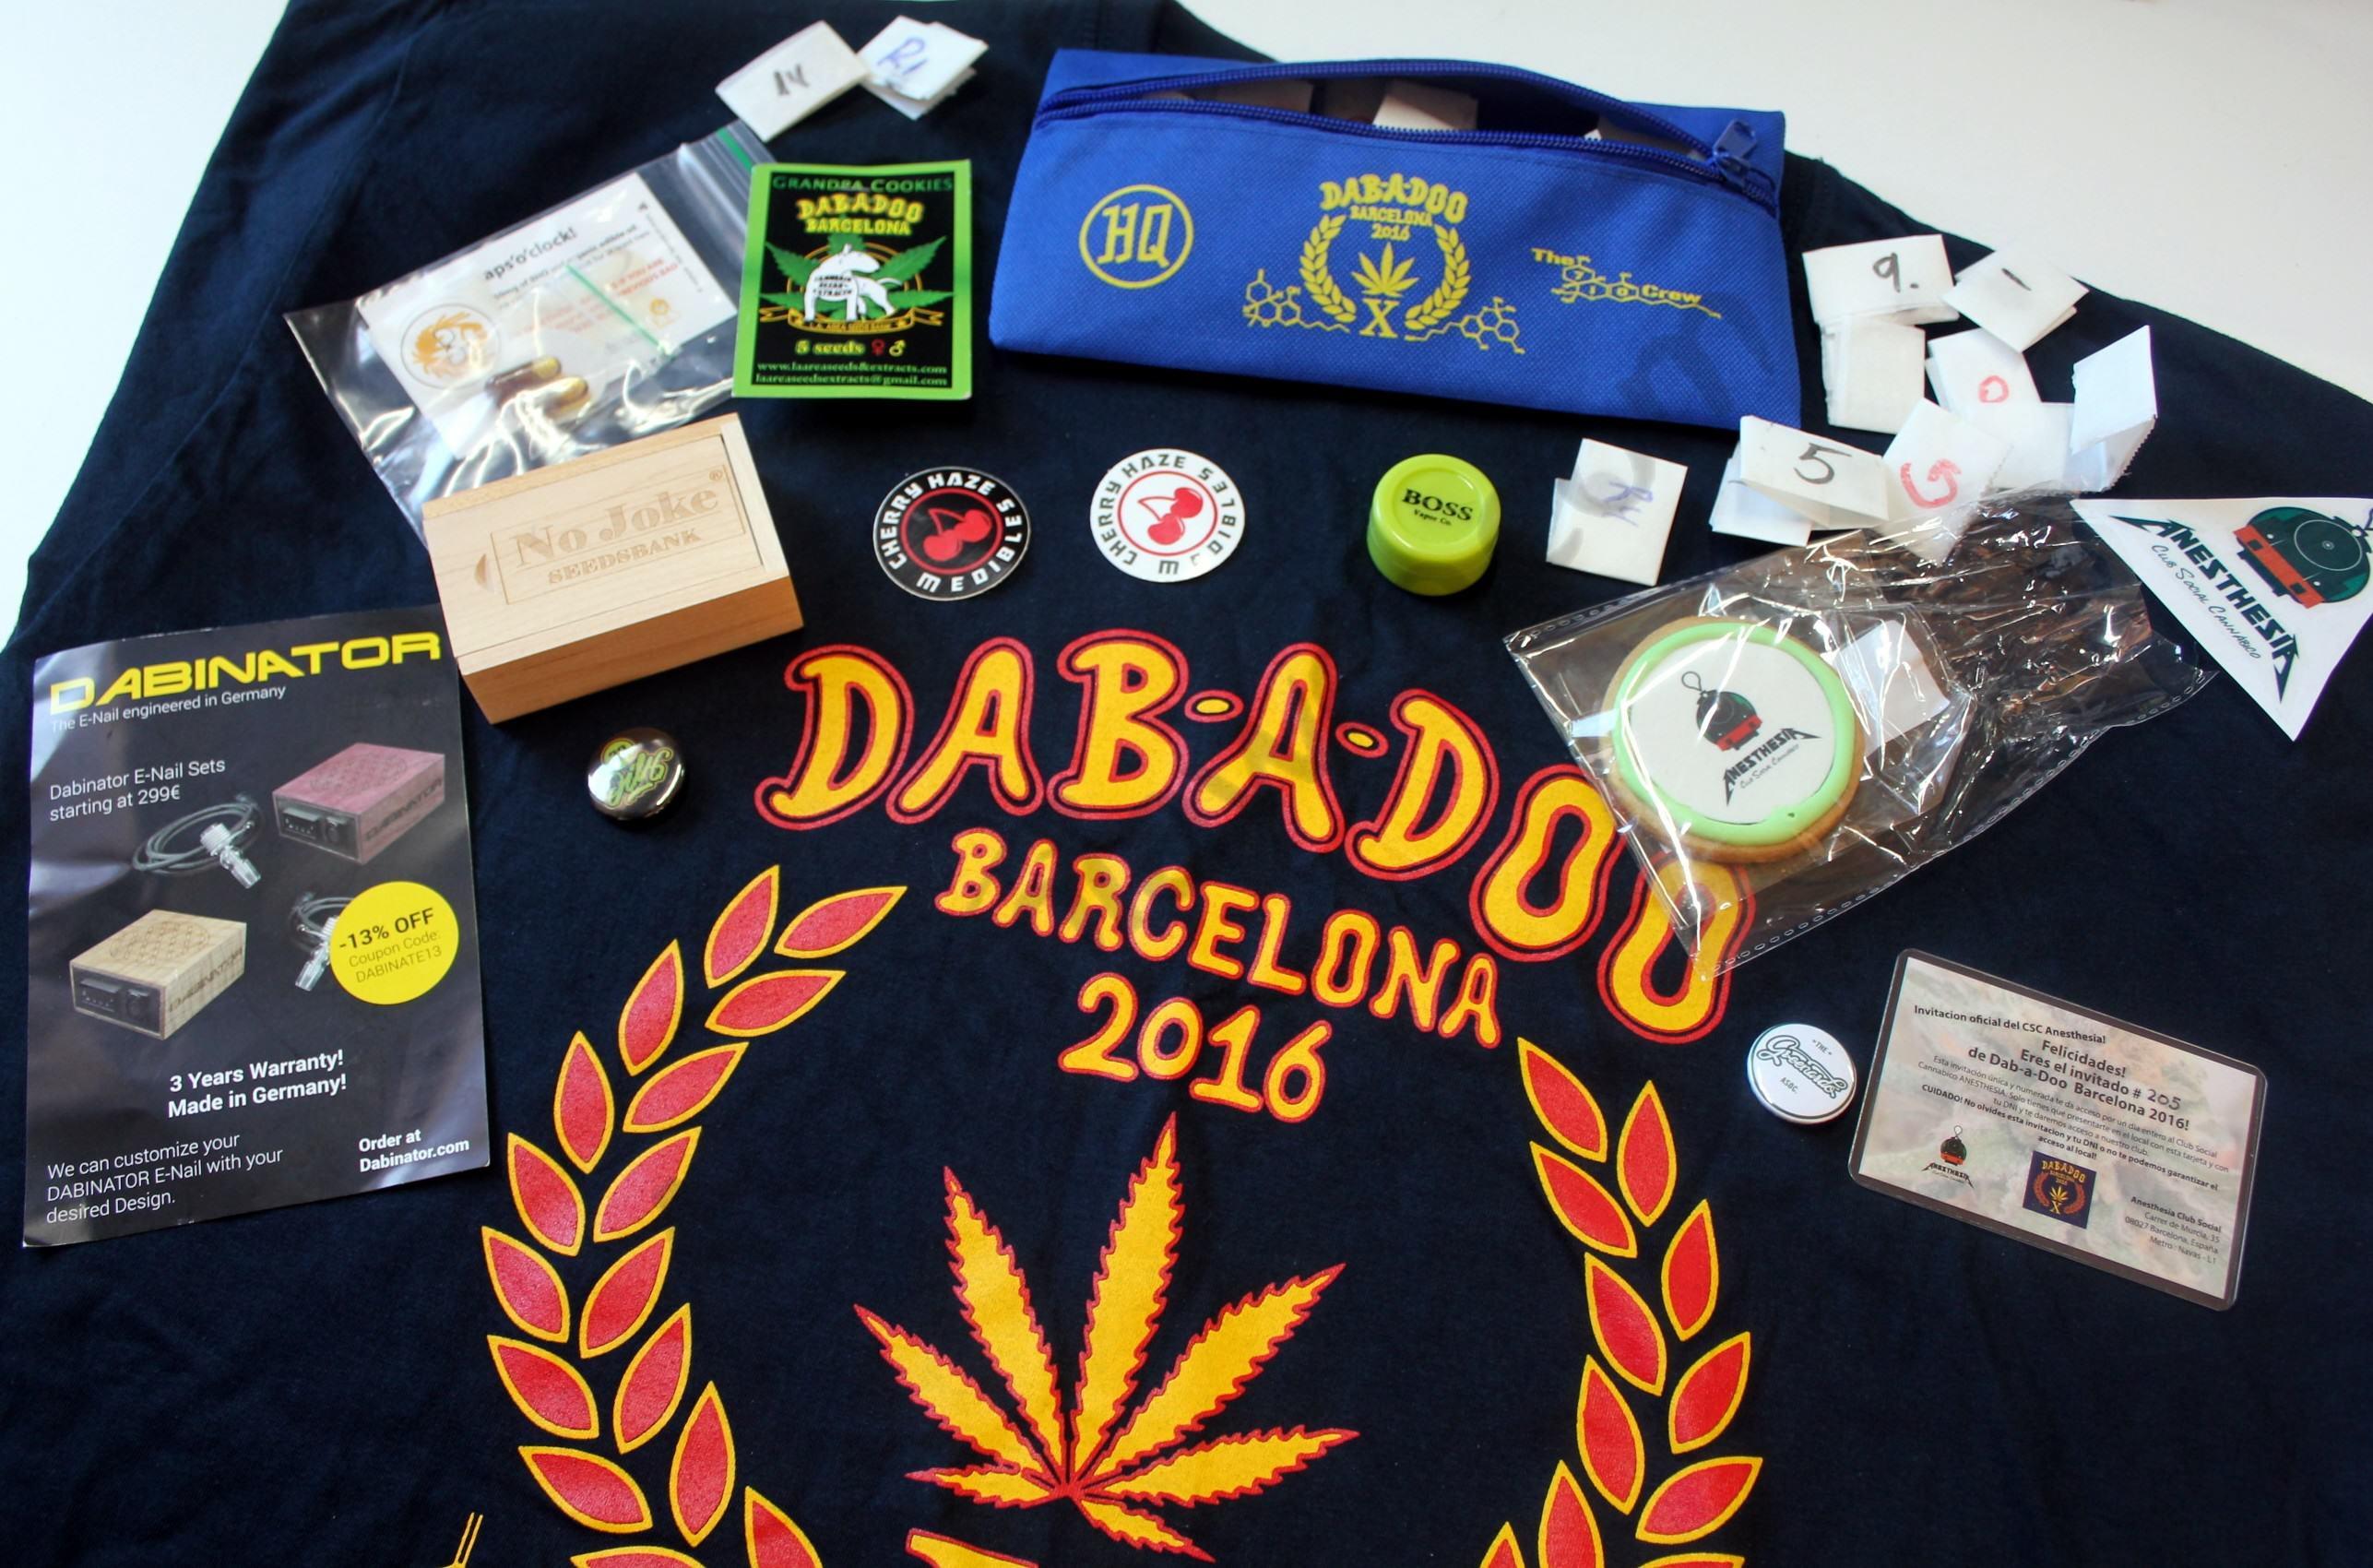 2016 Dab a Doo Barcelona